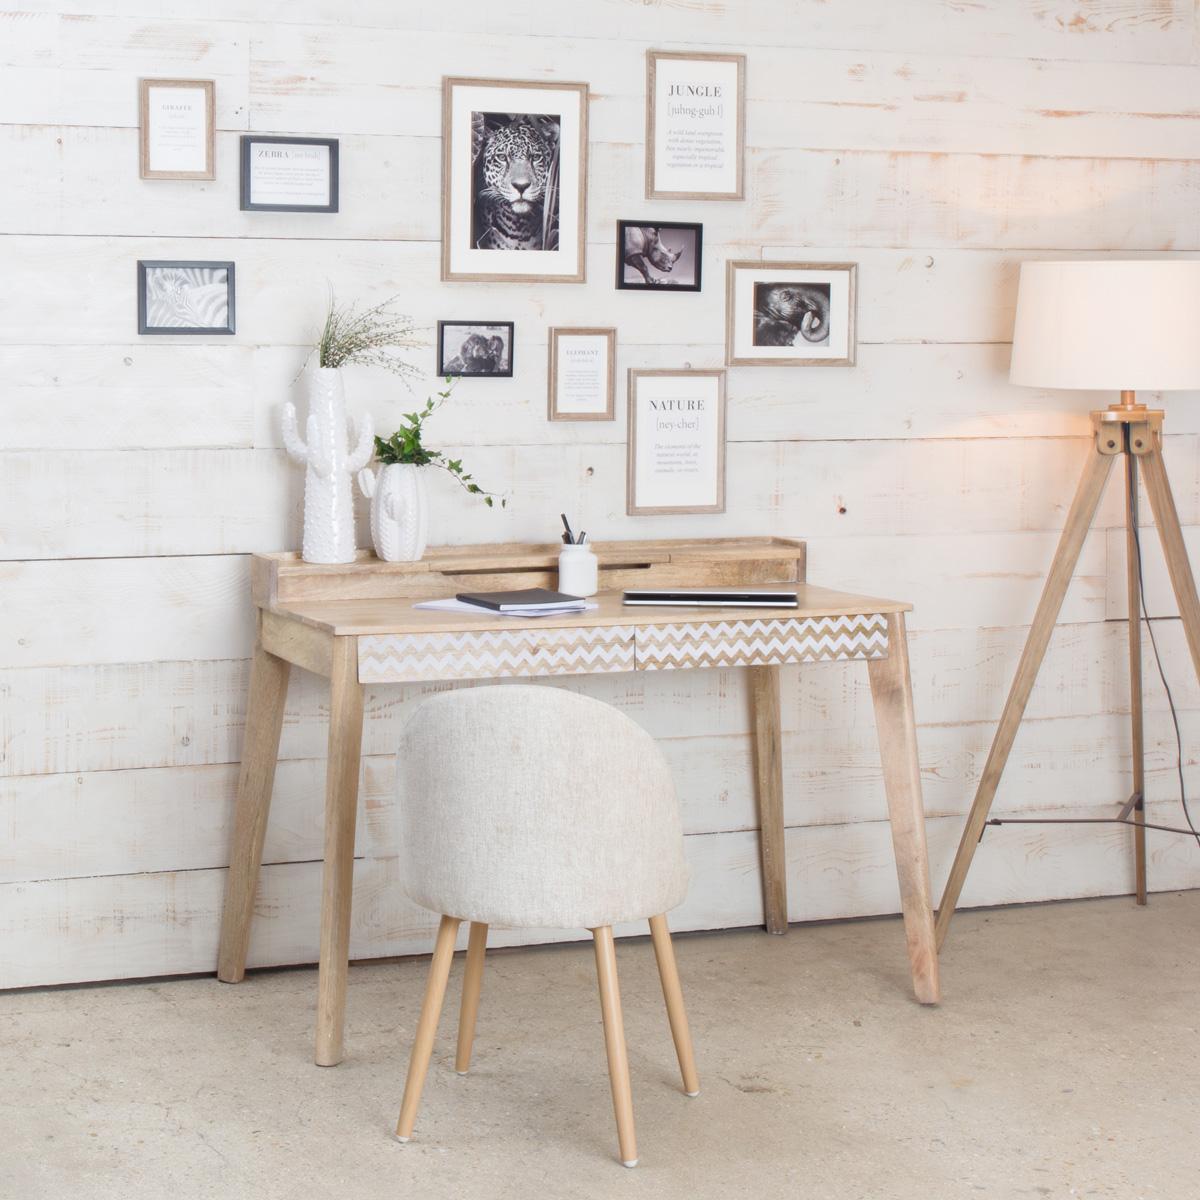 pupitre guide des produits. Black Bedroom Furniture Sets. Home Design Ideas